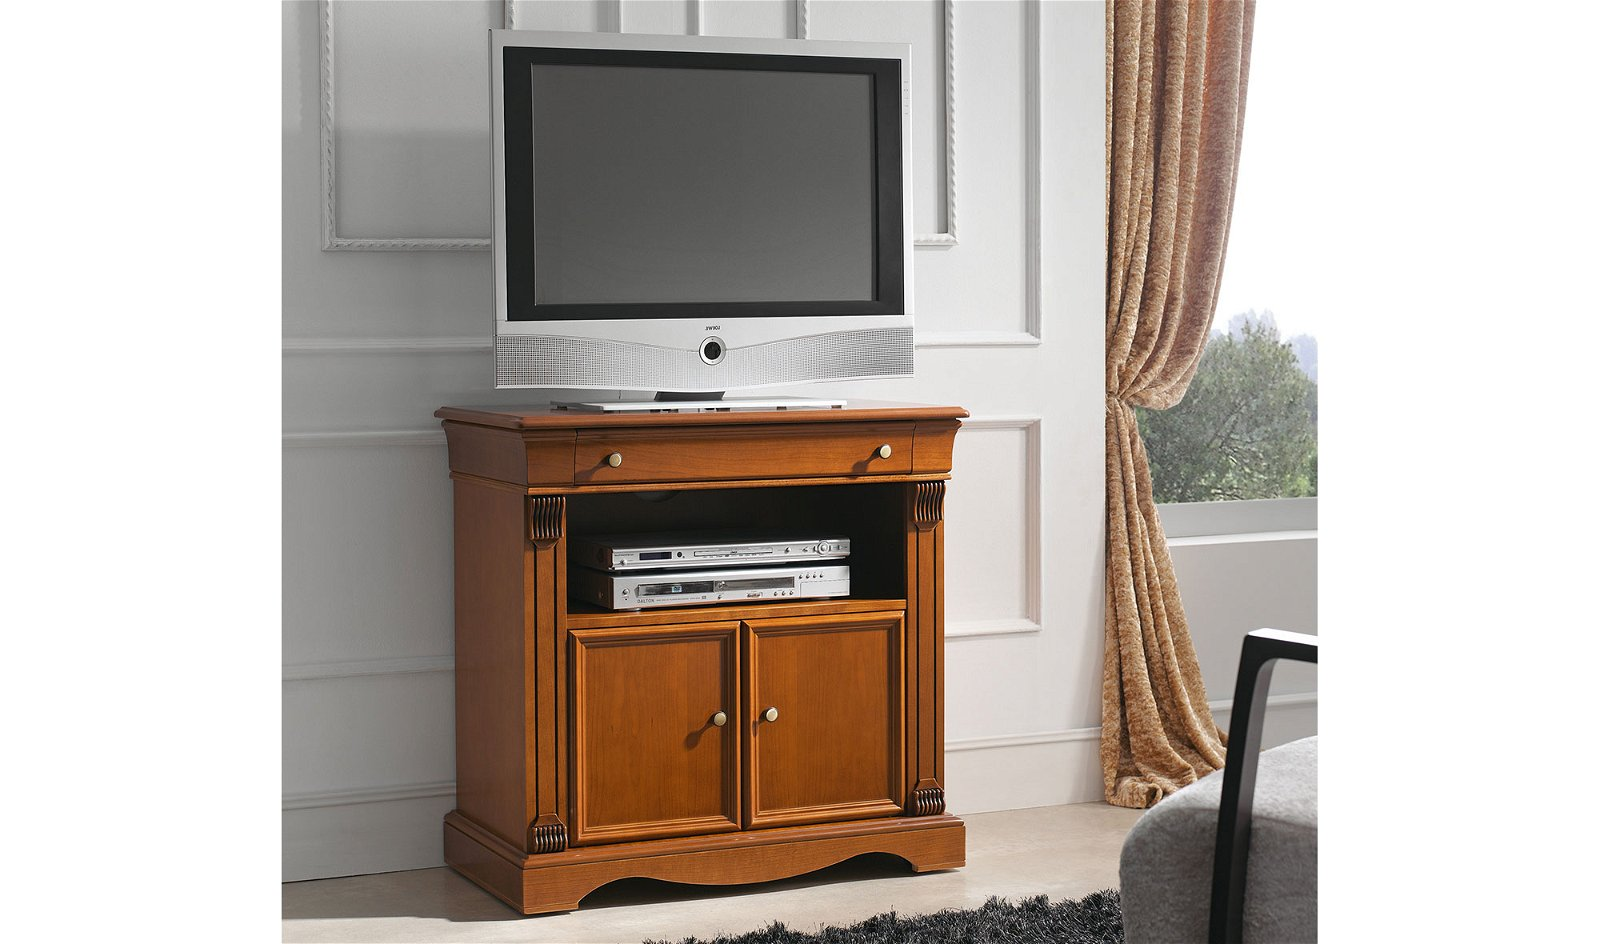 Mueble tv clásico Montauban